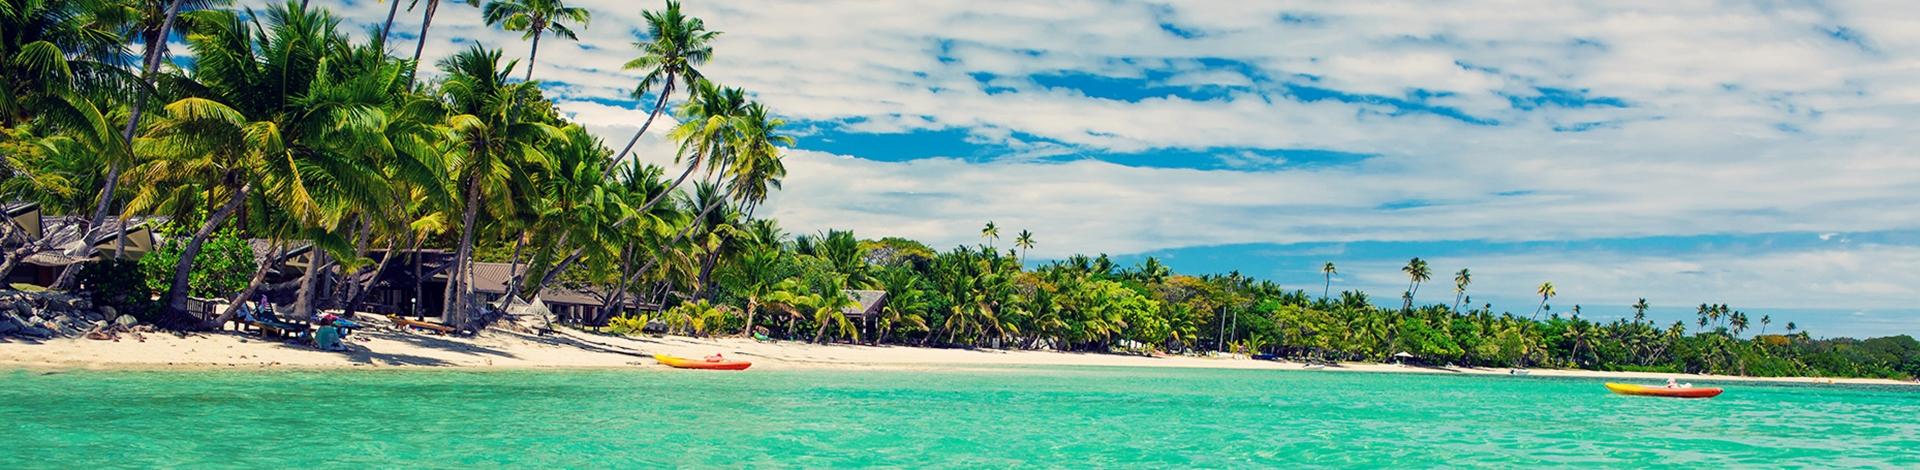 Castaway Island